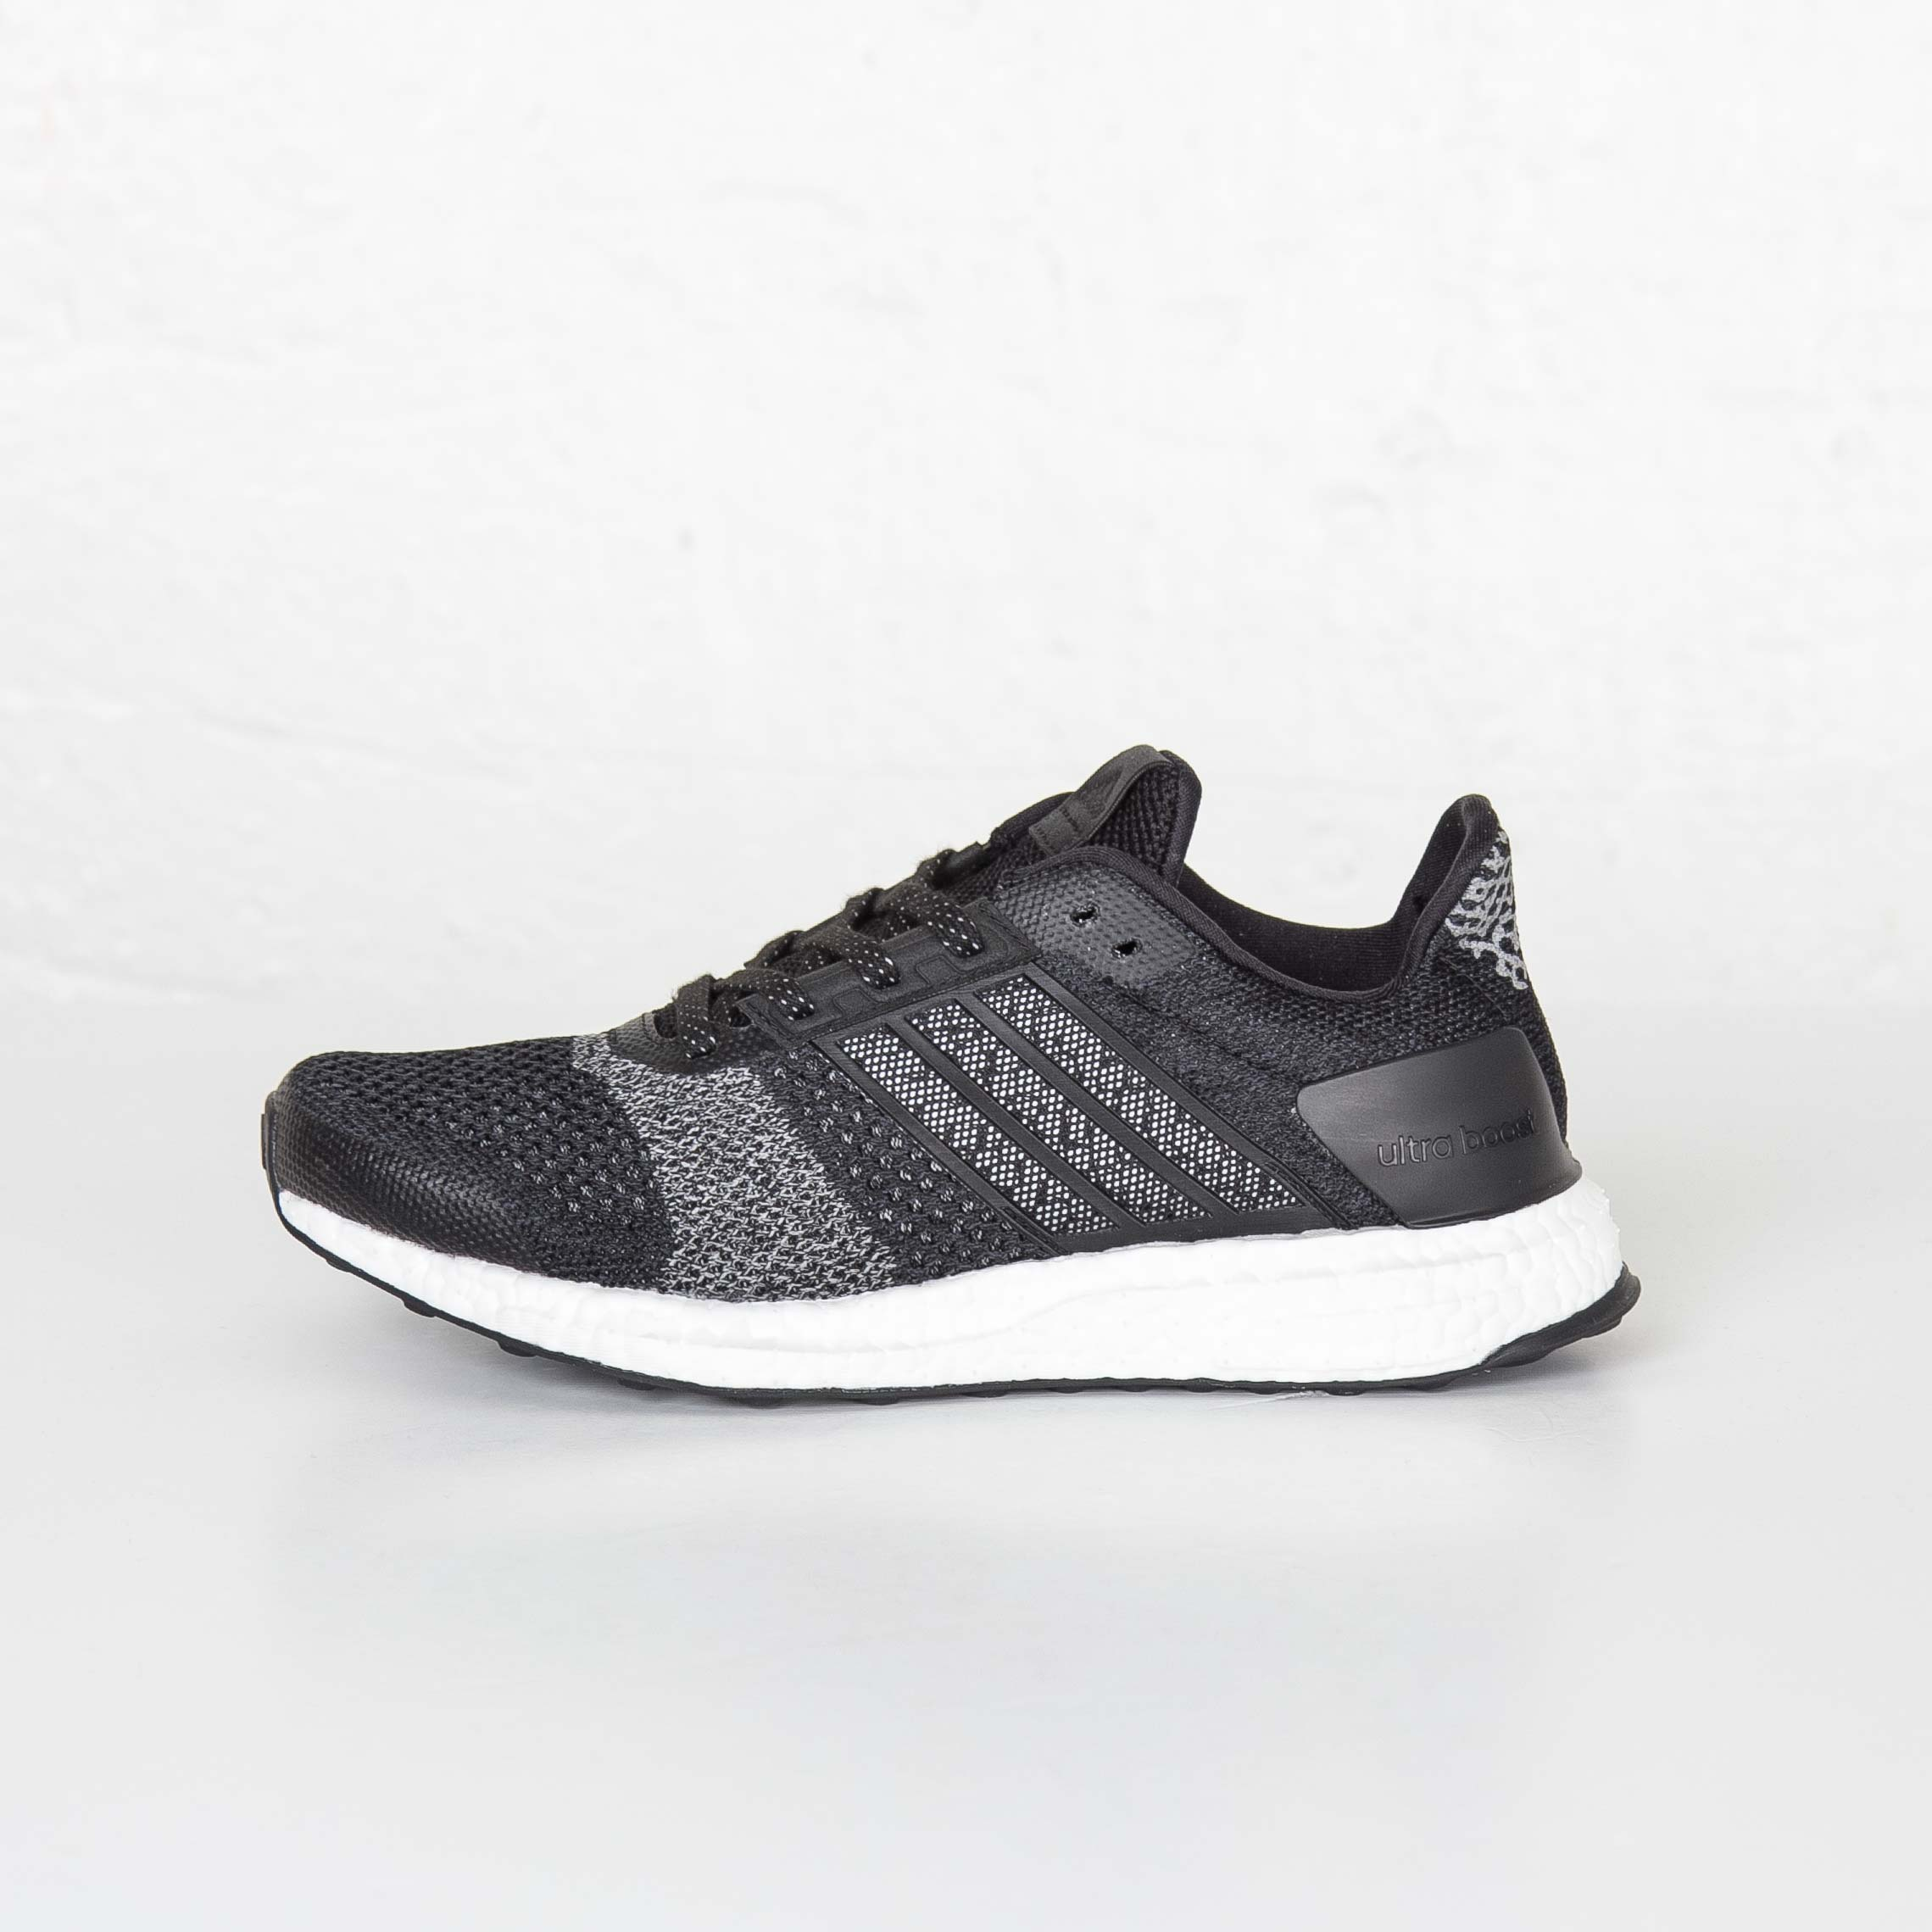 aa9133ce220e3 adidas Ultraboost ST Glow - Af6397 - Sneakersnstuff